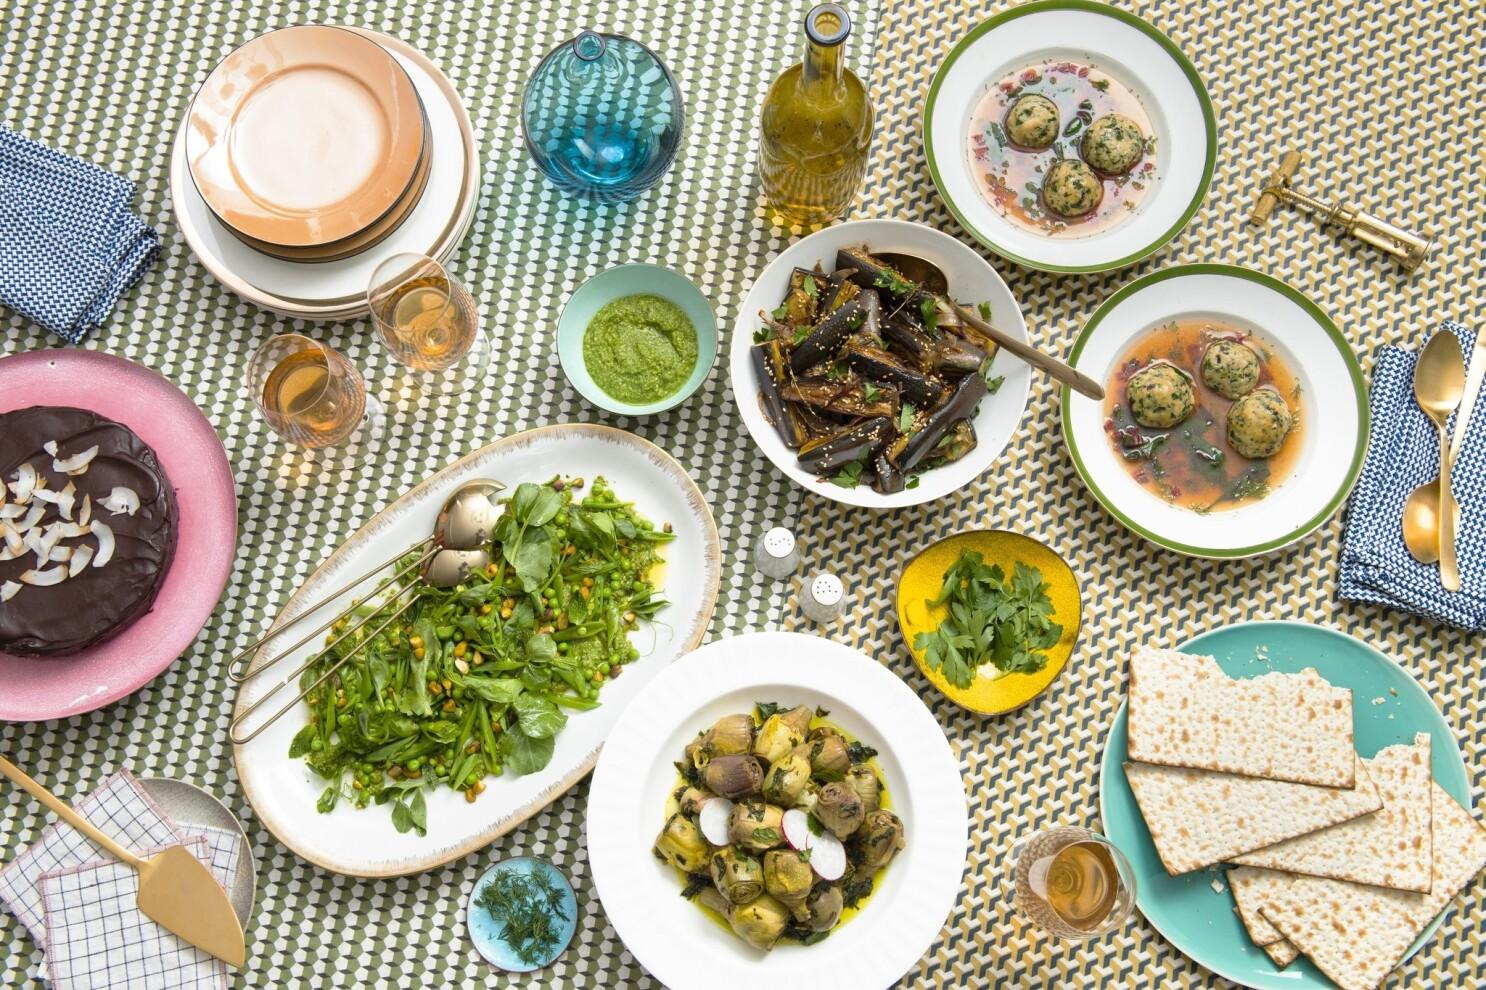 Coronavirus cooking Passover Seder recipes with pantry staples - The San Diego Union-Tribune